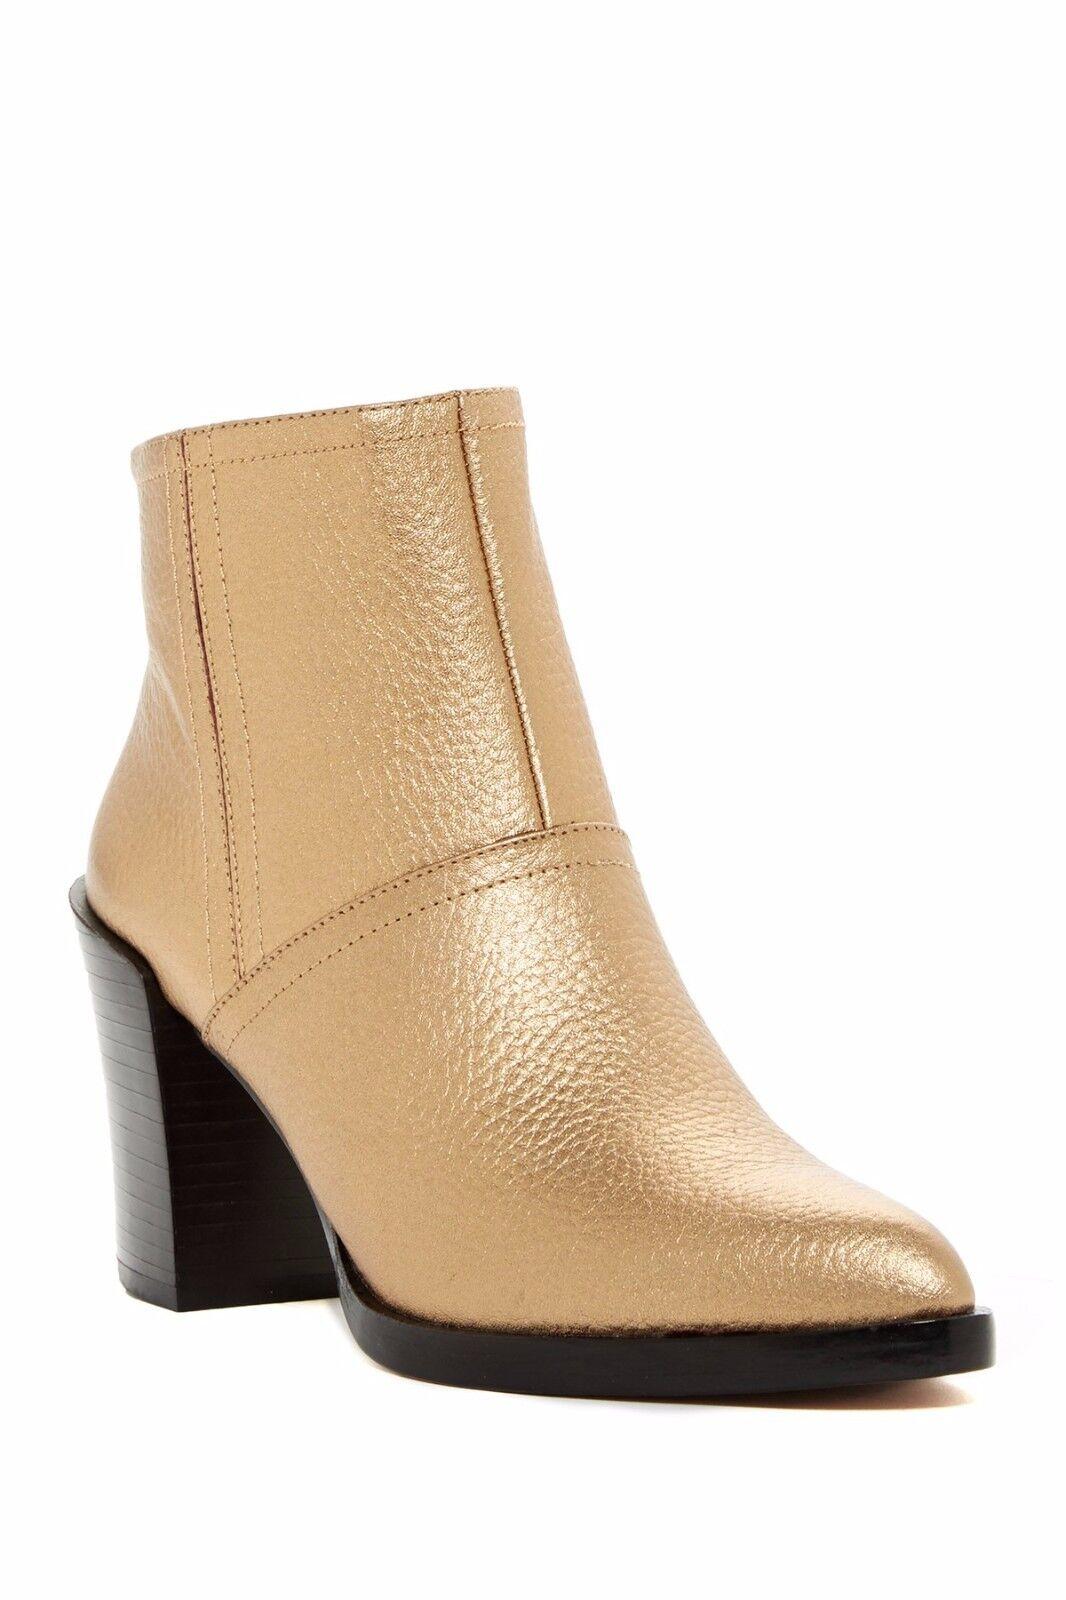 DEREK LAM Gold 10 CROSBY RAINE Copper Gold LAM Metalic Leder Stiefel Bootie Sz 9 NIB 395 867d9d